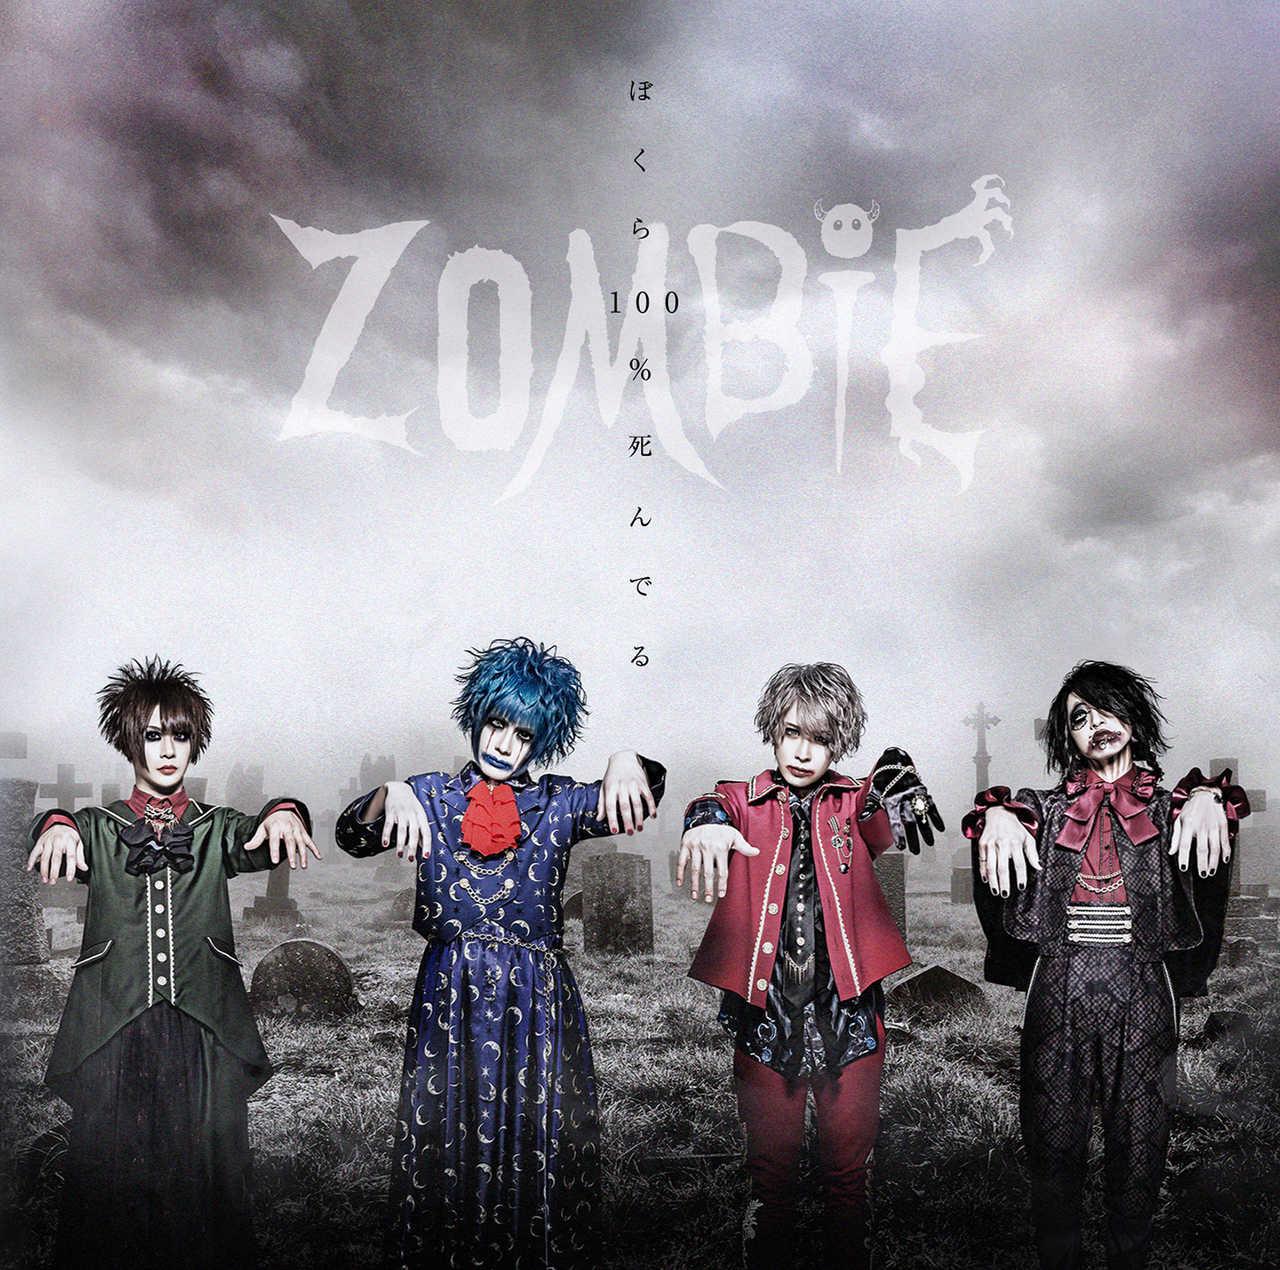 ZOMBIE、4月29日(水)発売の1stアルバムから「100%死んでる」MV公開!